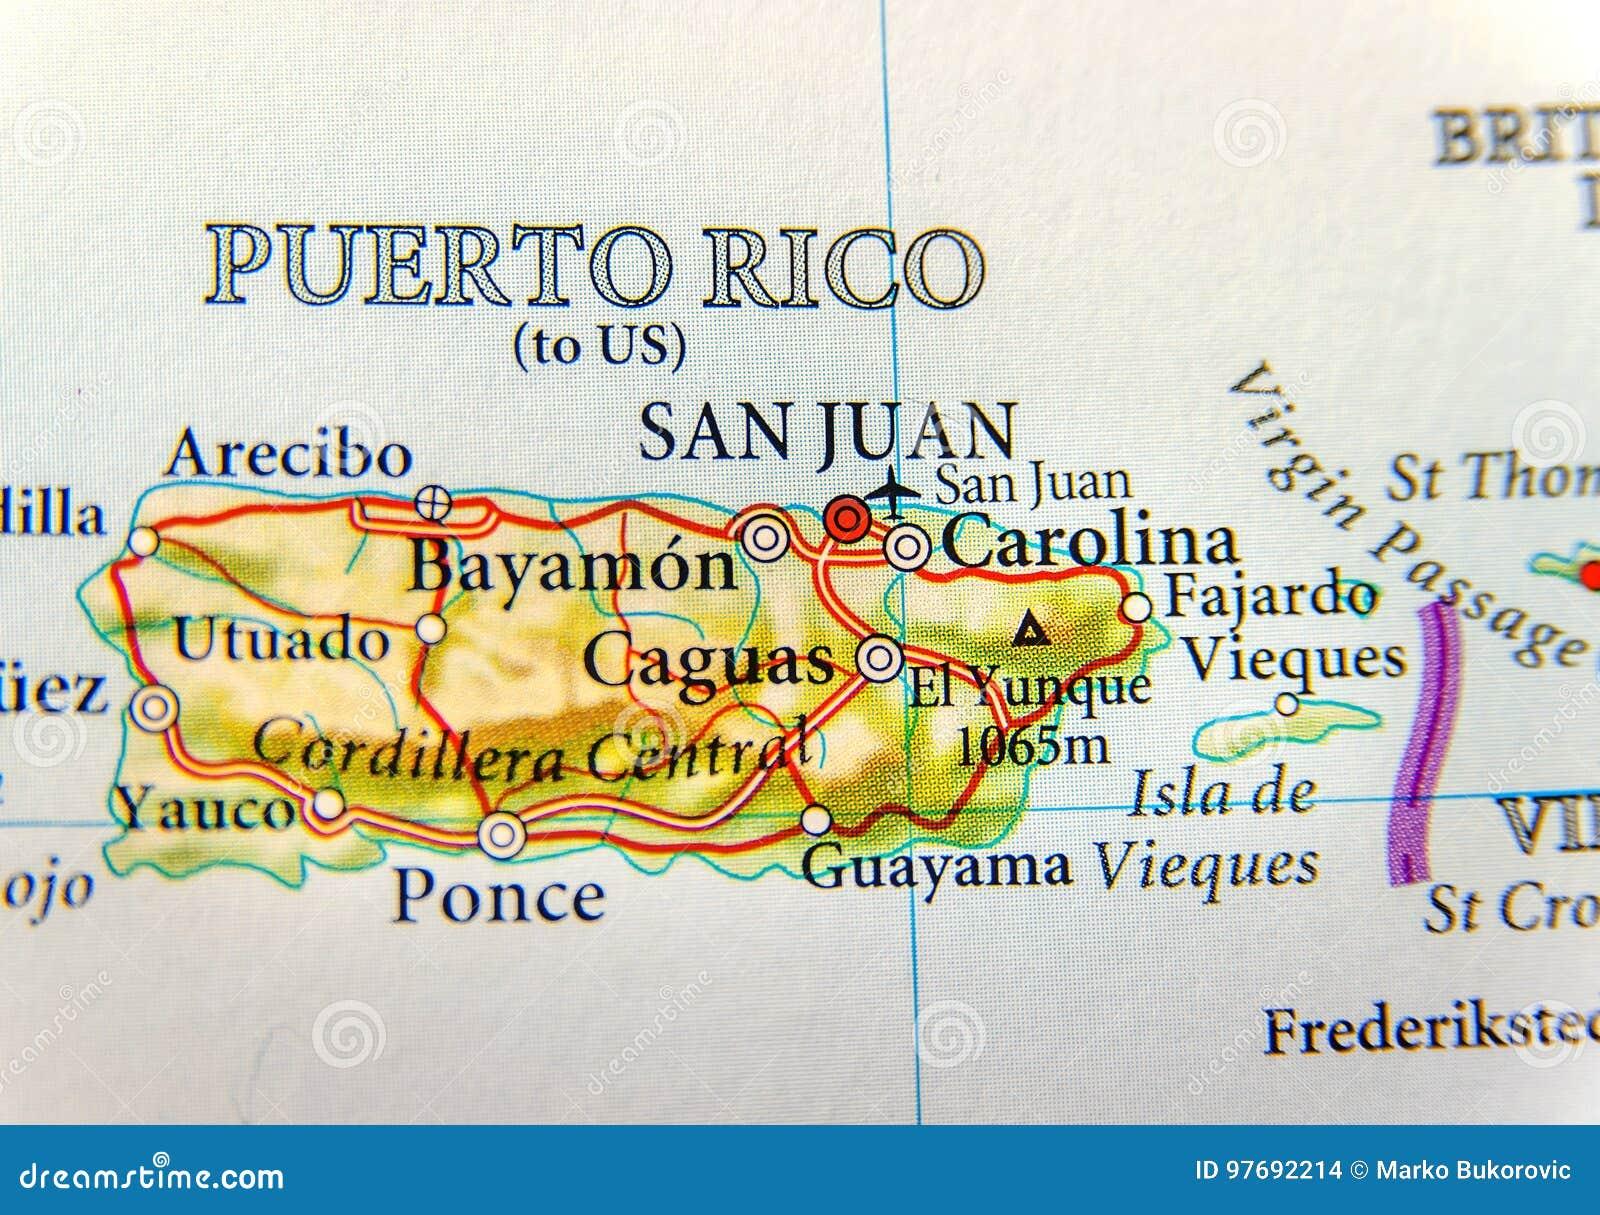 Geographische Karte Von Puerto Rico Mit Hauptstadt San Juan